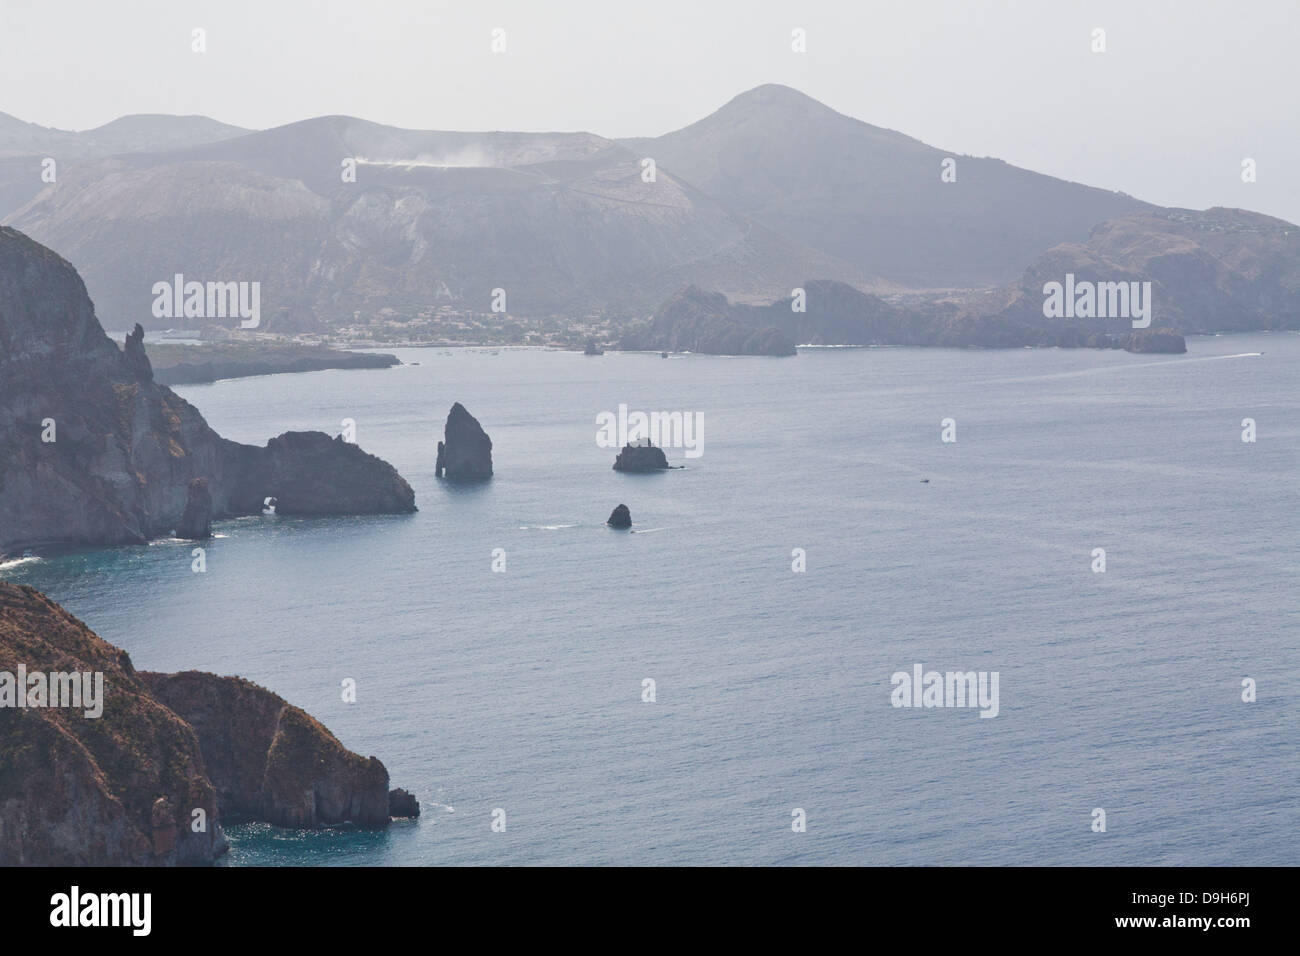 Quattrocchi viewpoint over Vulcano and the spiky faraglioni rocks, Lipari, Aeolian Islands, Italy - Stock Image